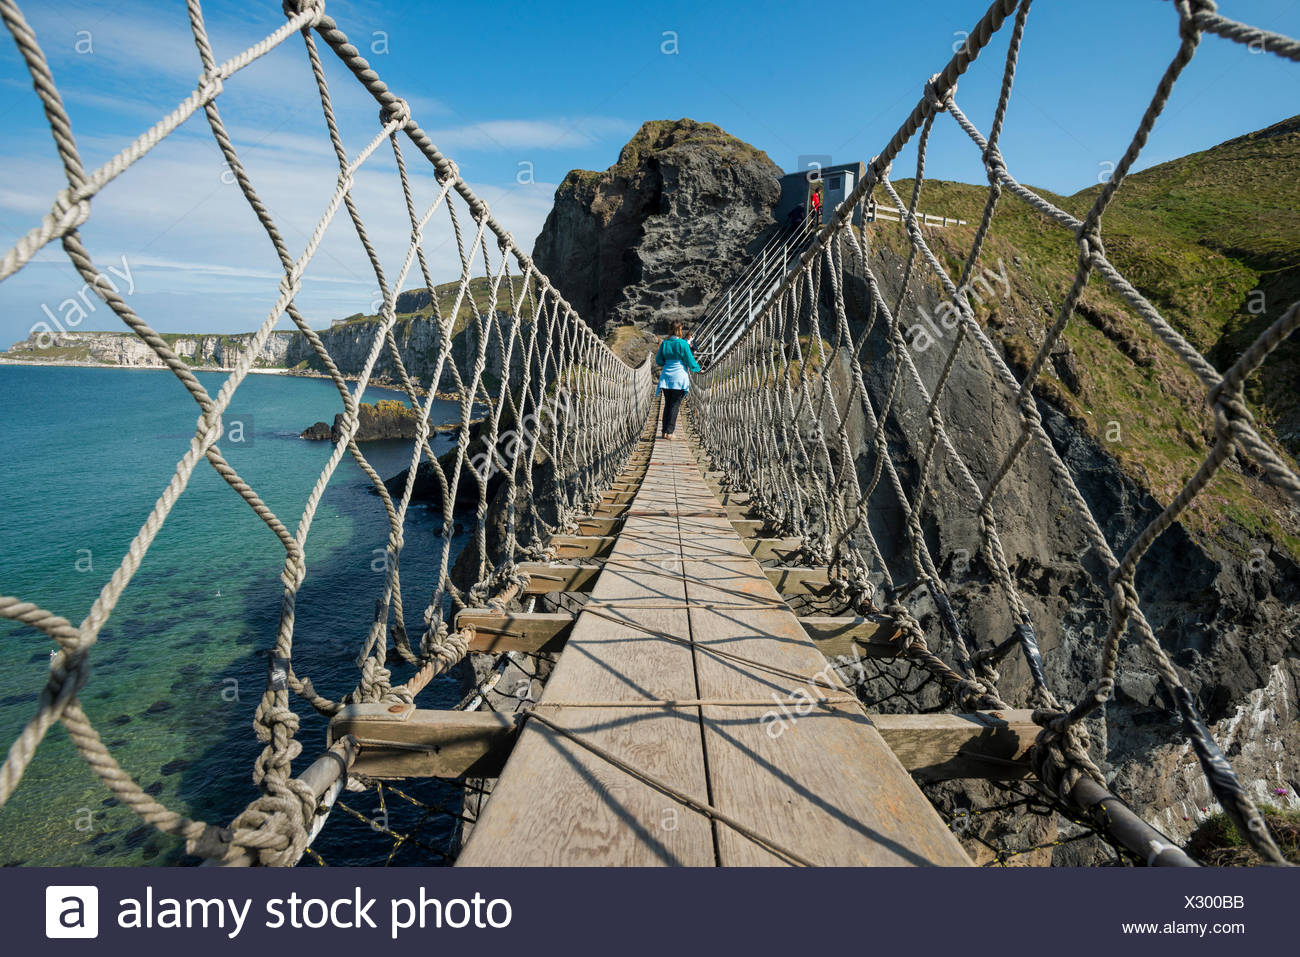 Carrick-a-Rede Bridge, woman crossing the suspension bridge, Moyle, Northern Ireland, United Kingdom, Europe - Stock Image